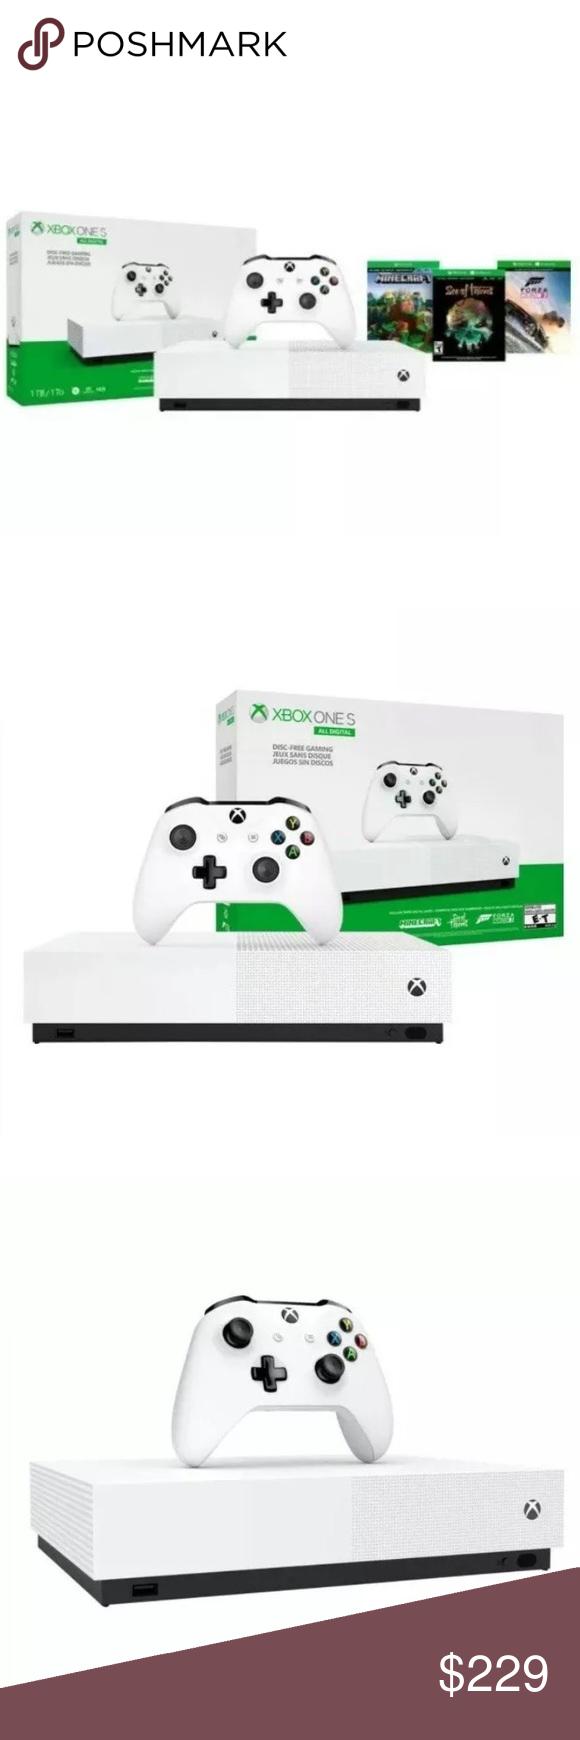 Microsoft Xbox One S 1 TB Forza Horizon 3 Bundle Microsoft